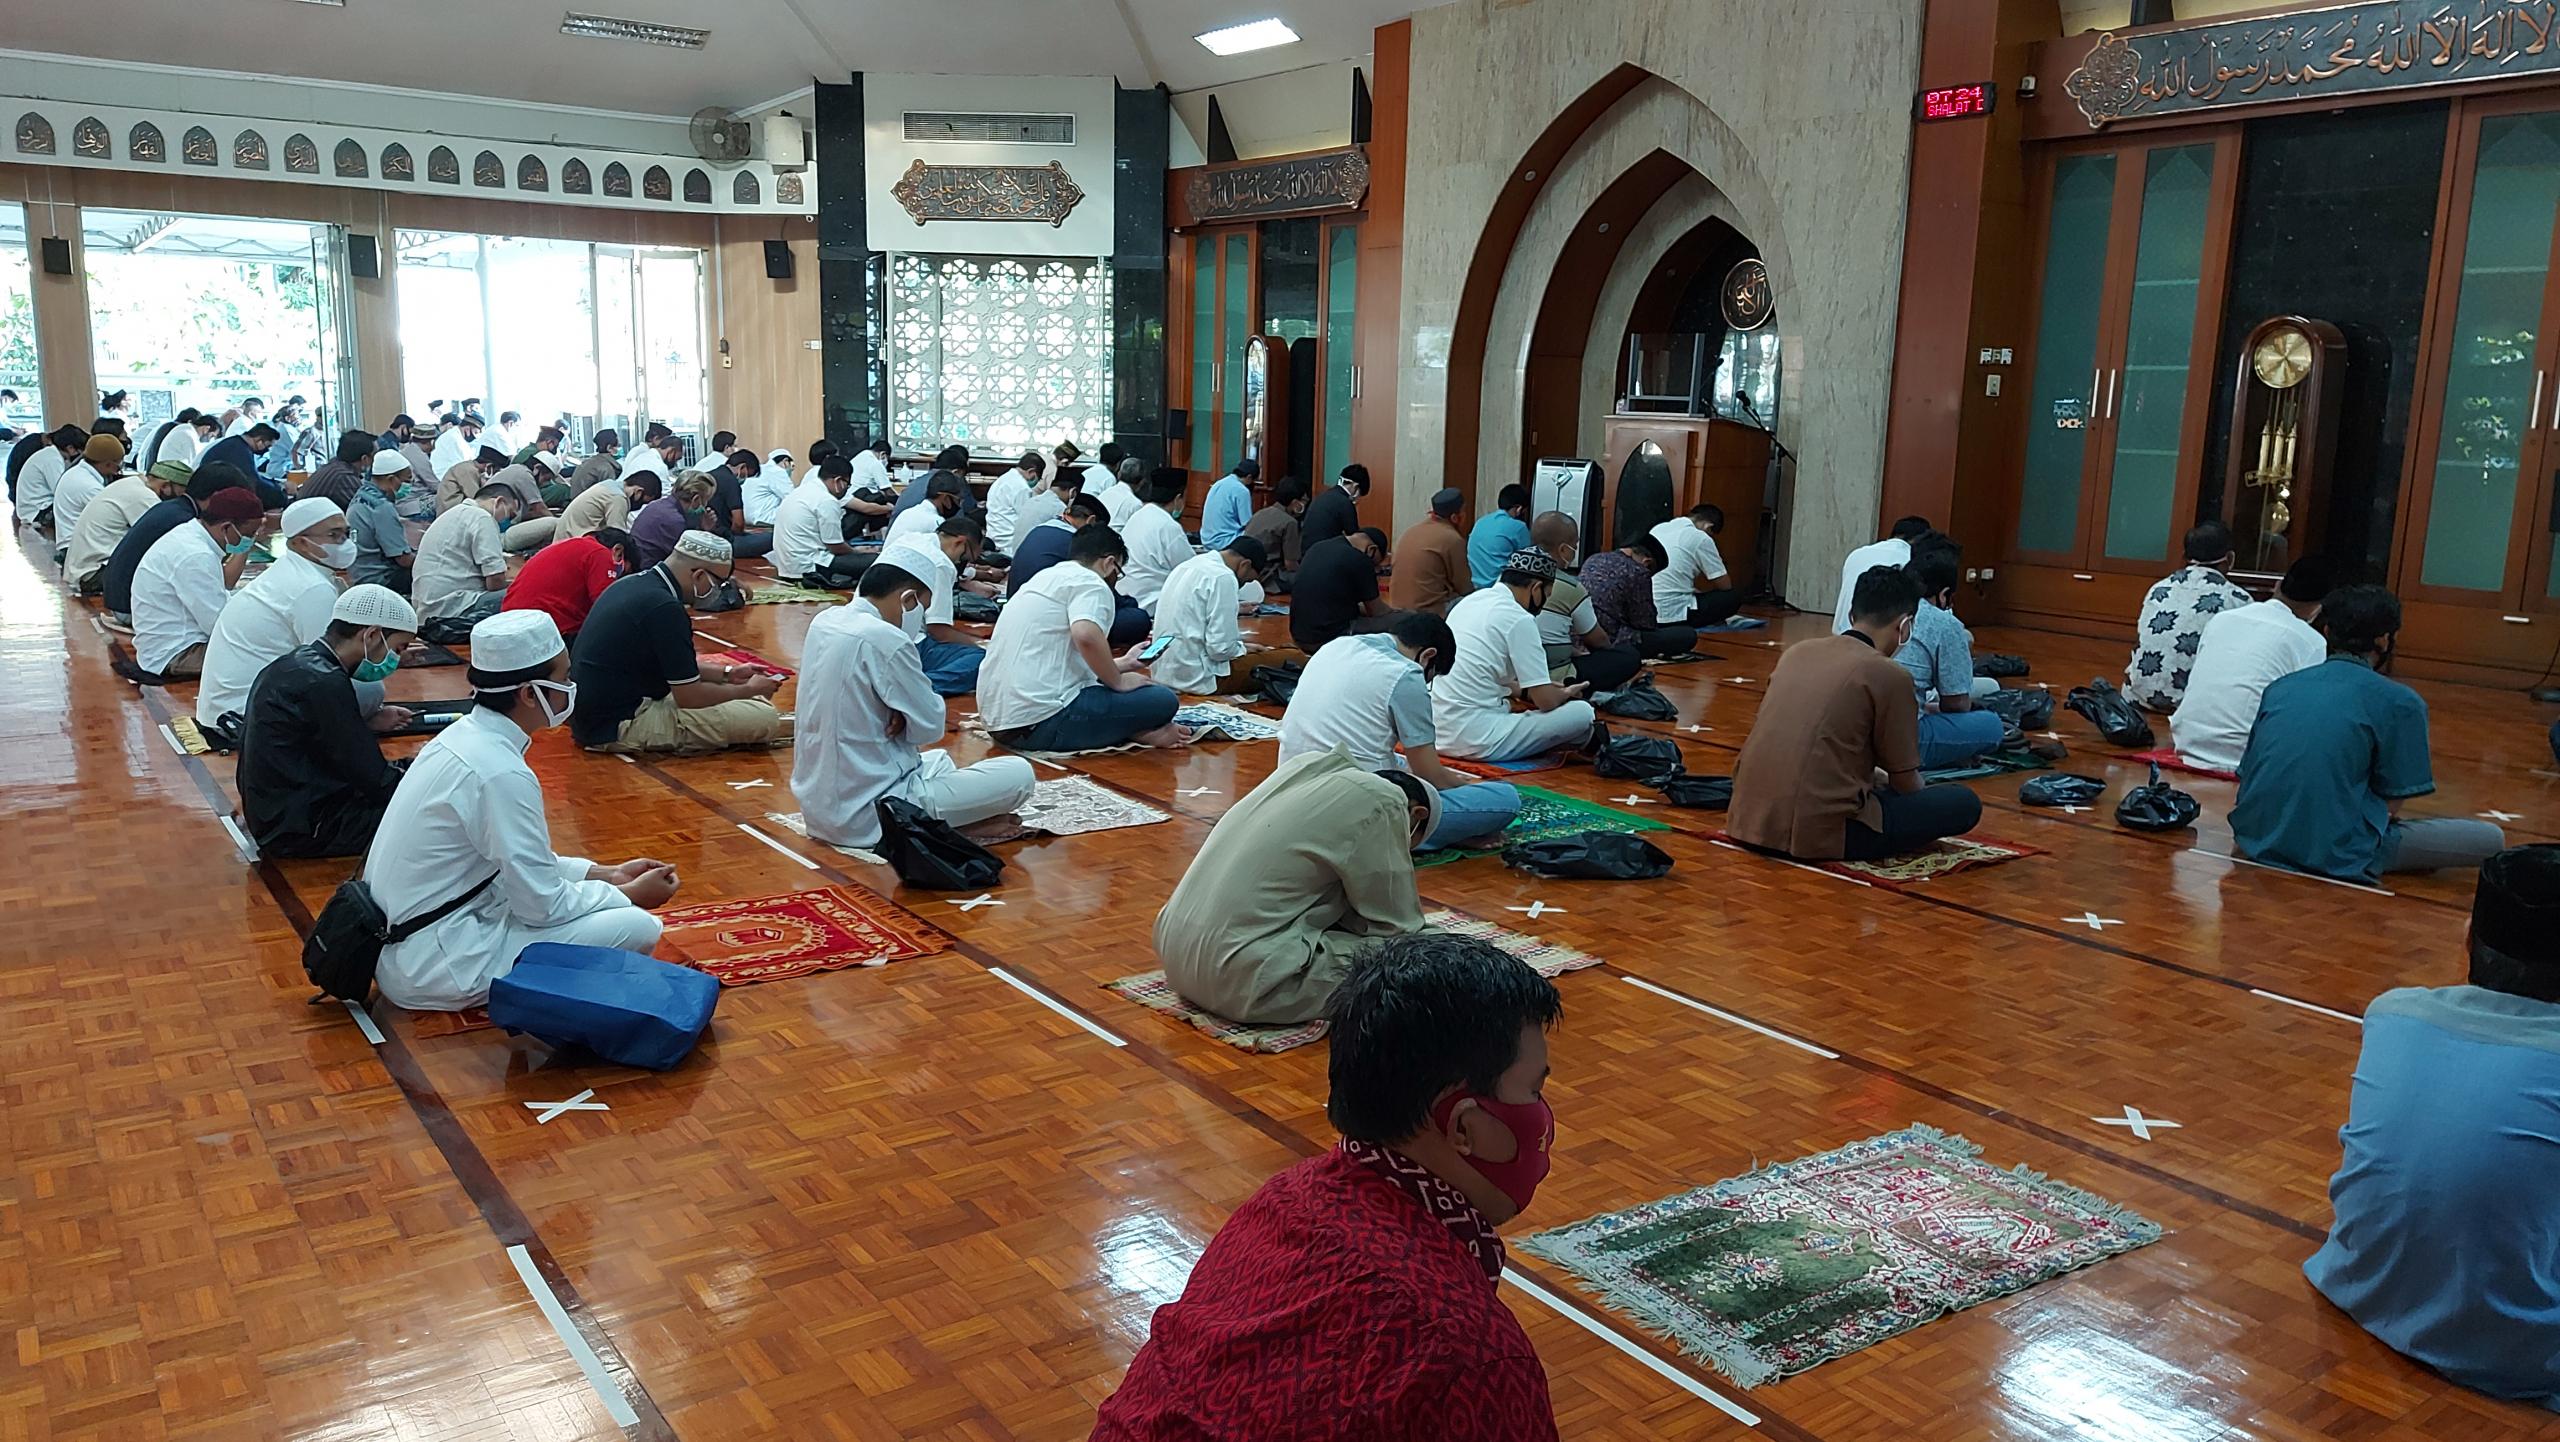 Sholat Jum'at di Masjid Al Ikhlas Saat Pandemi COVID-19